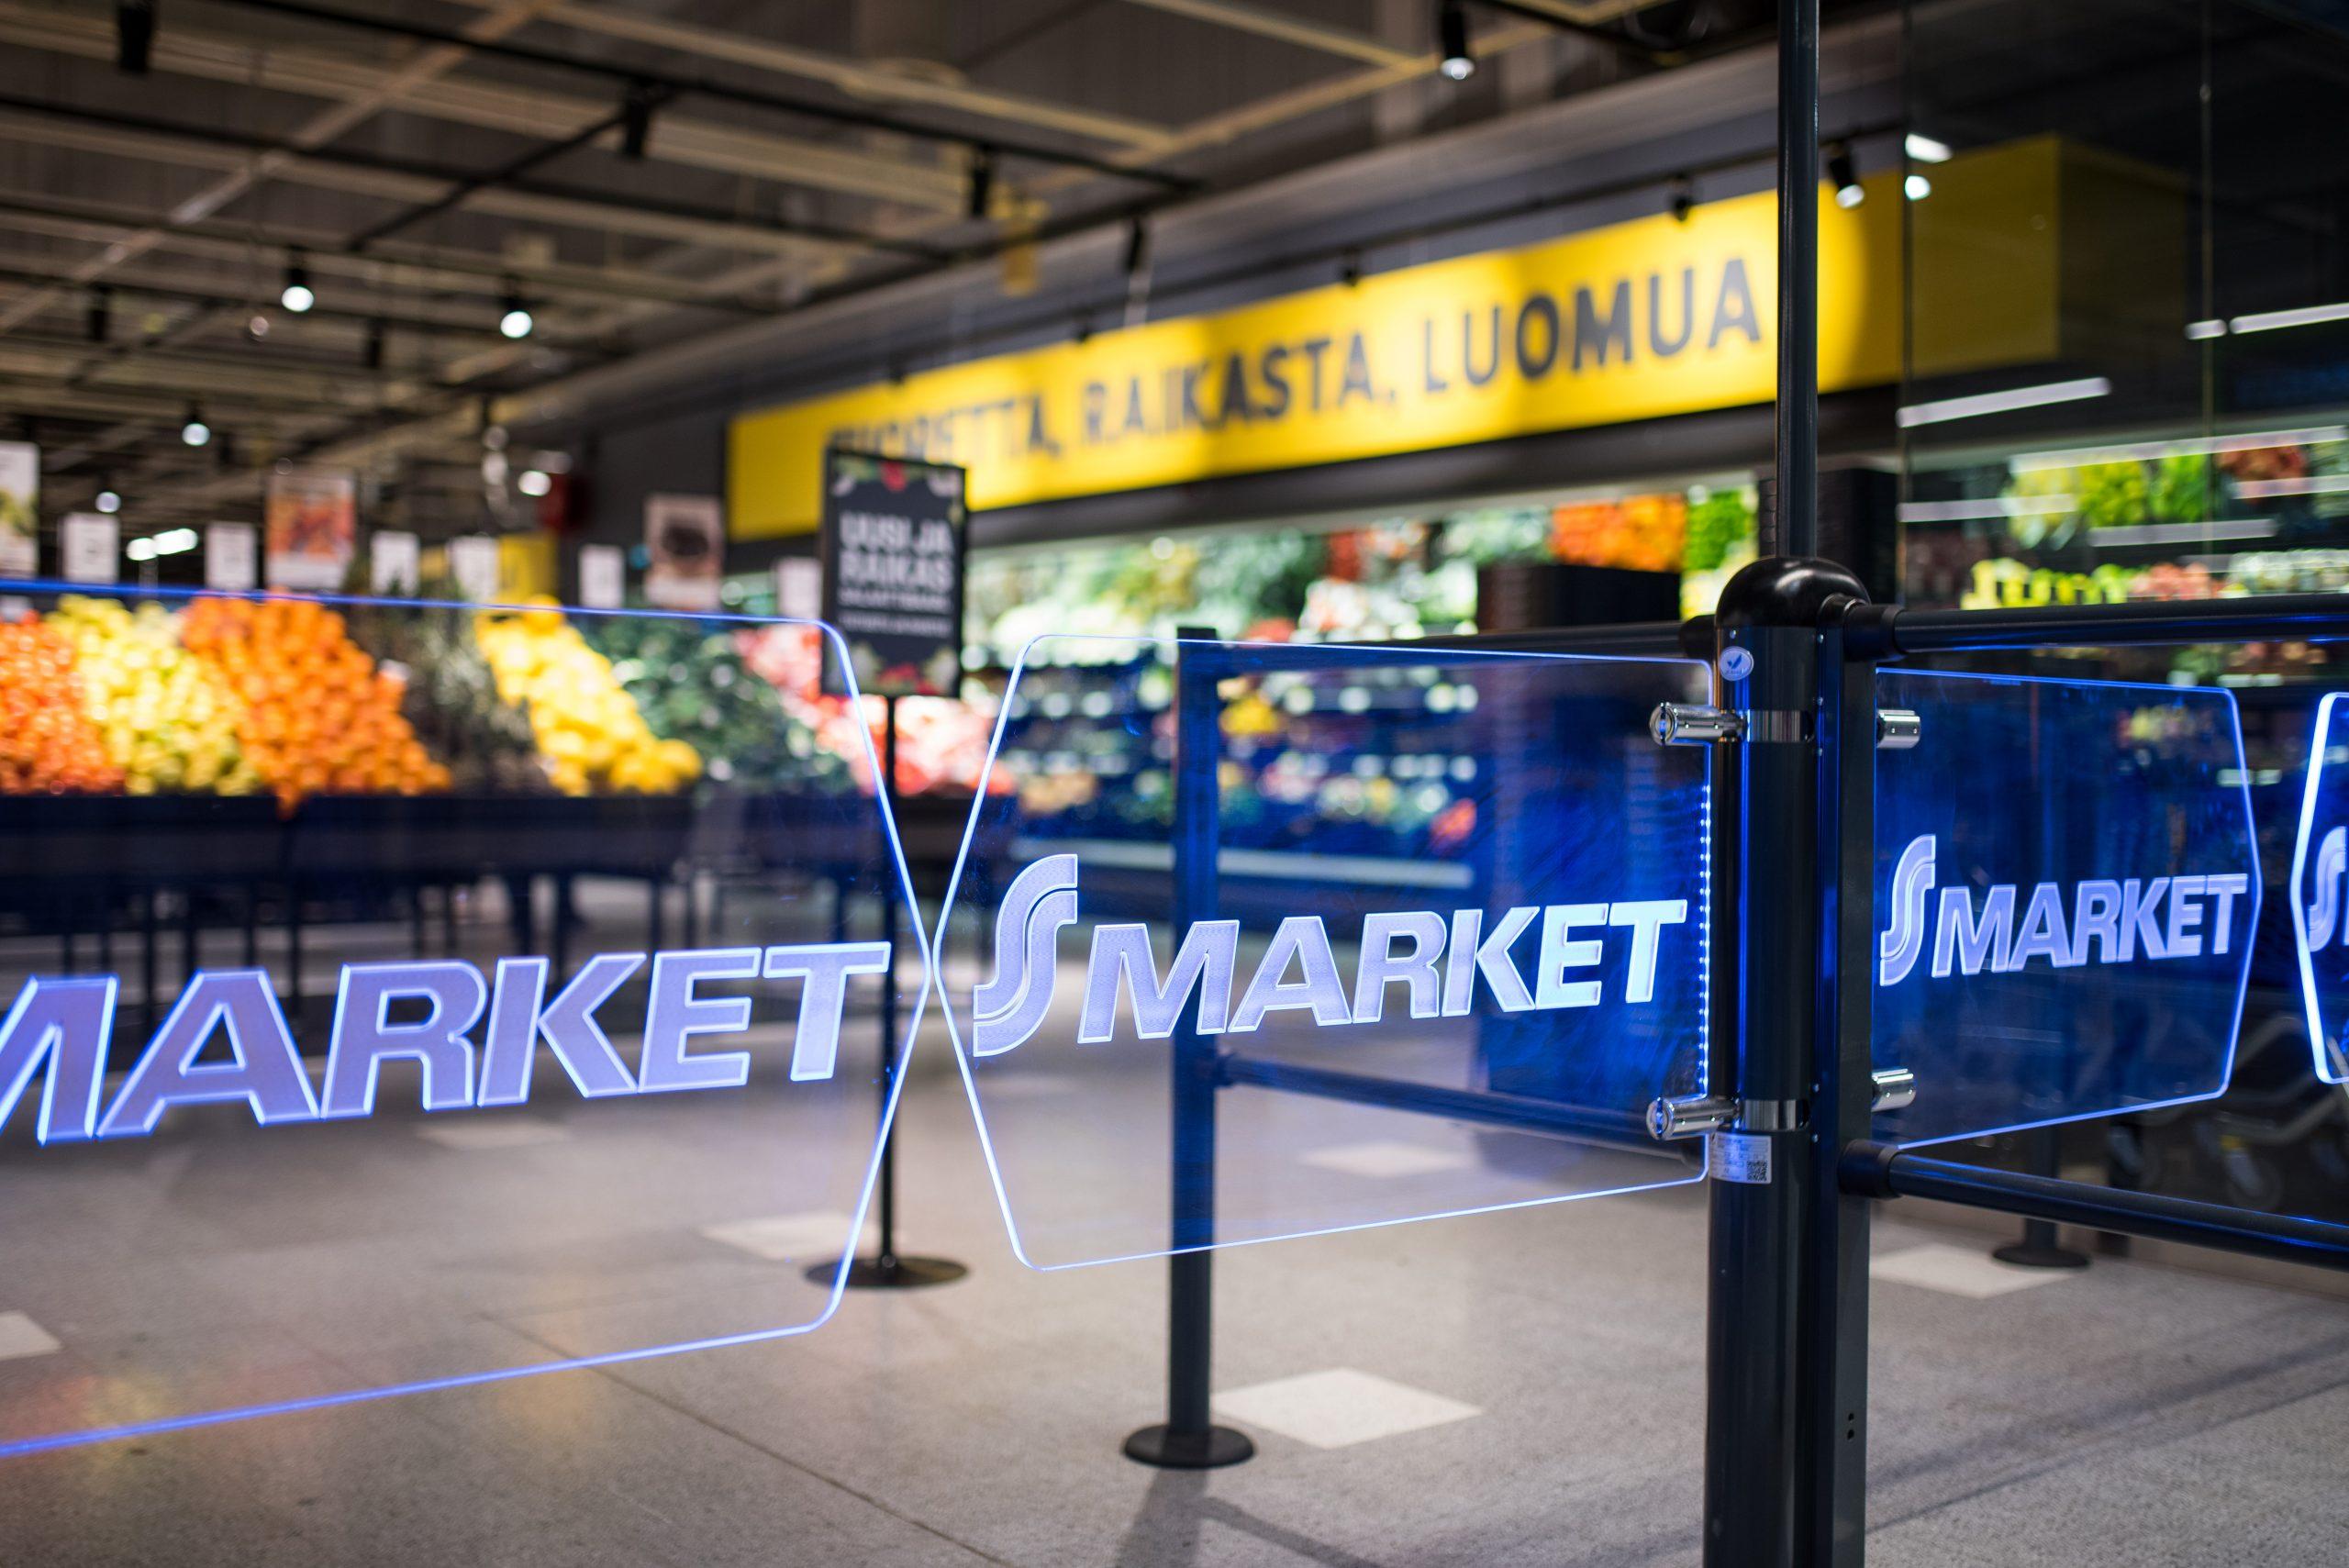 S-Market Ranua